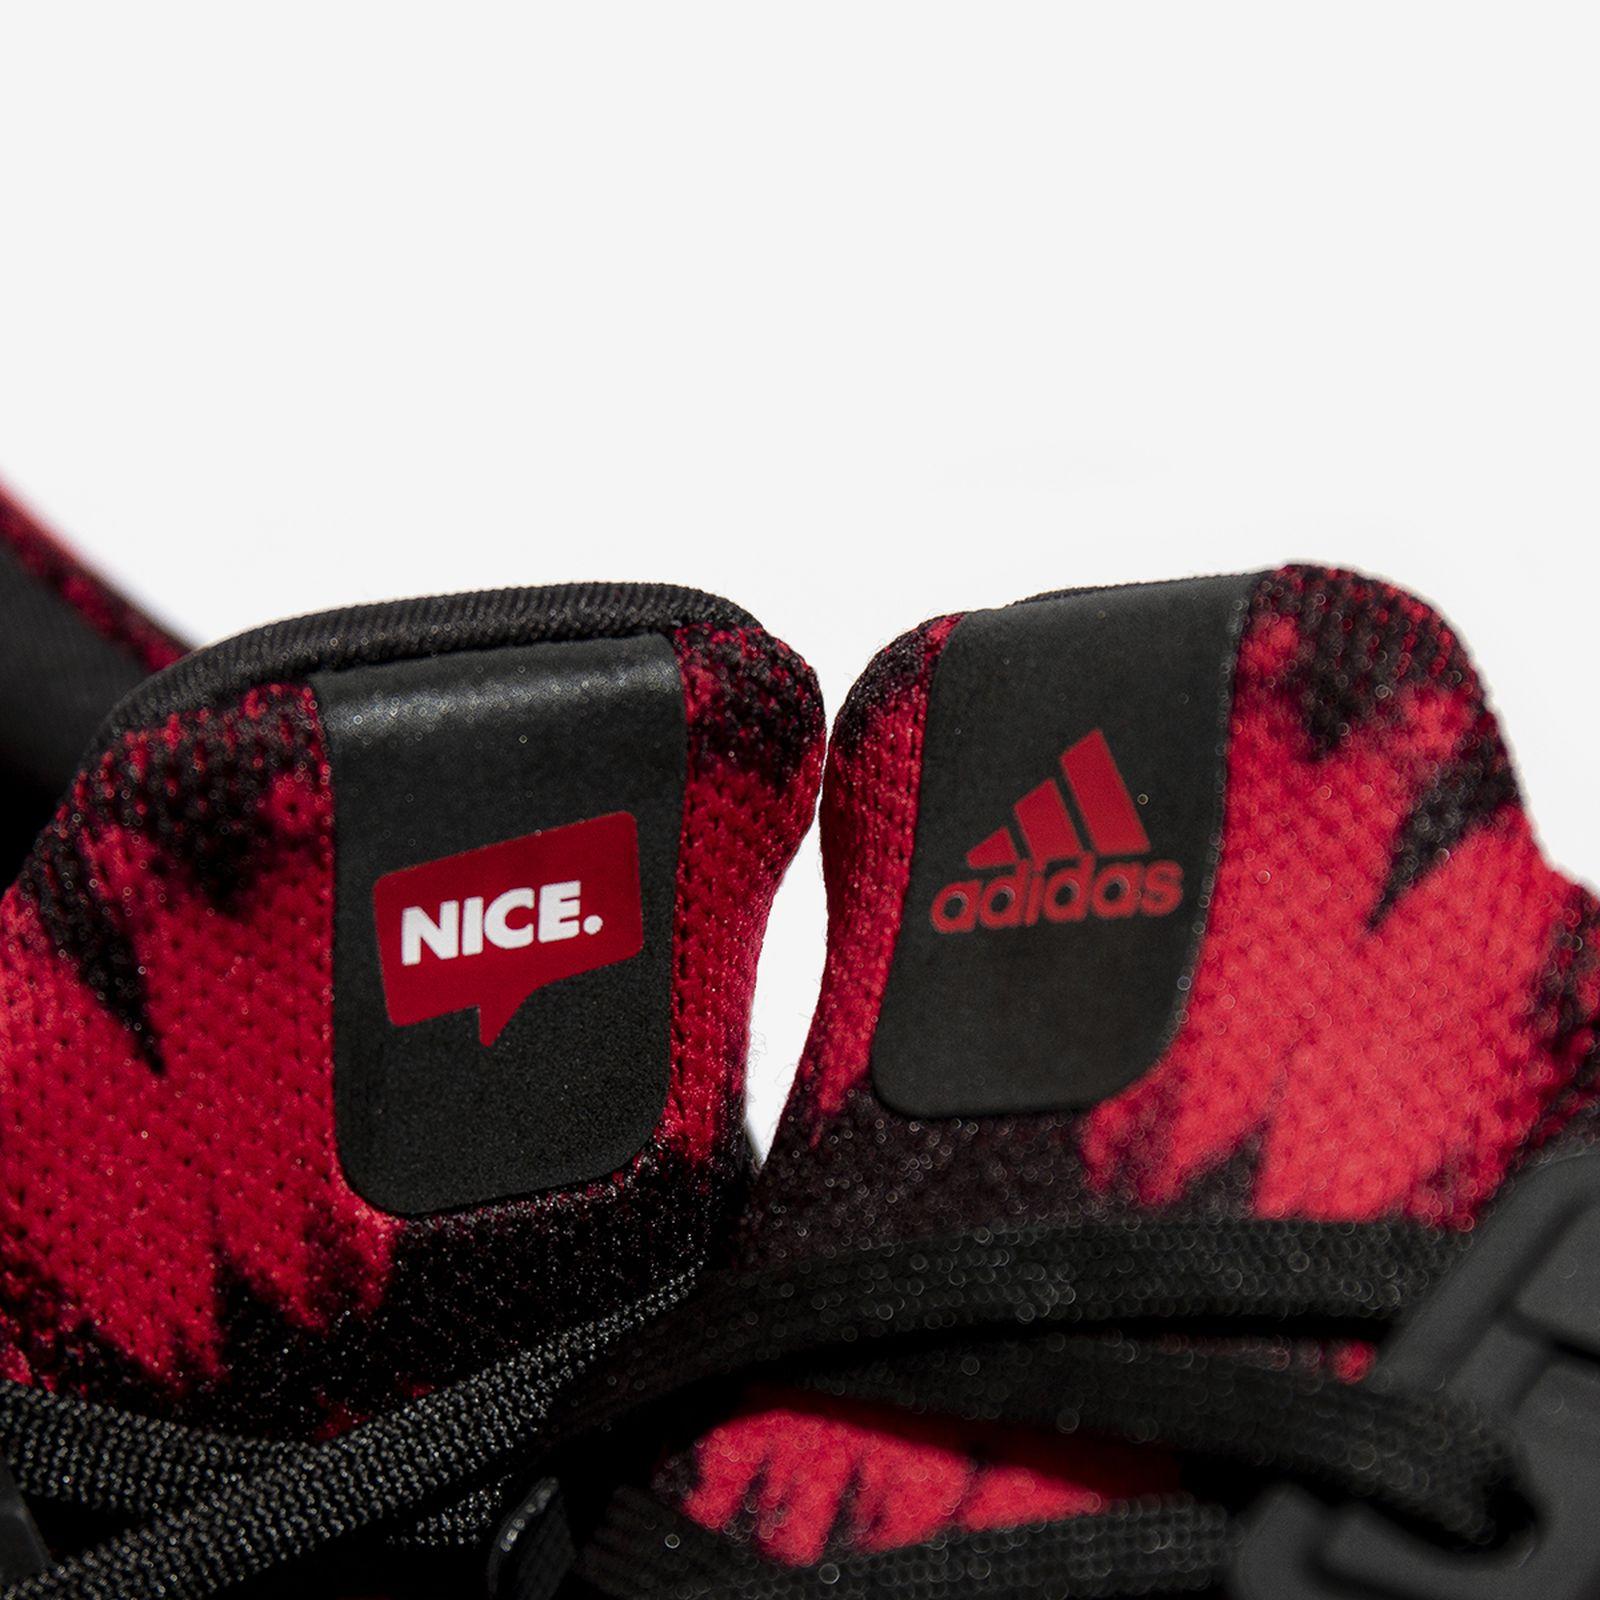 nice-kicks-adidas-ultraboost-no-vacancy-release-date-price-1-07